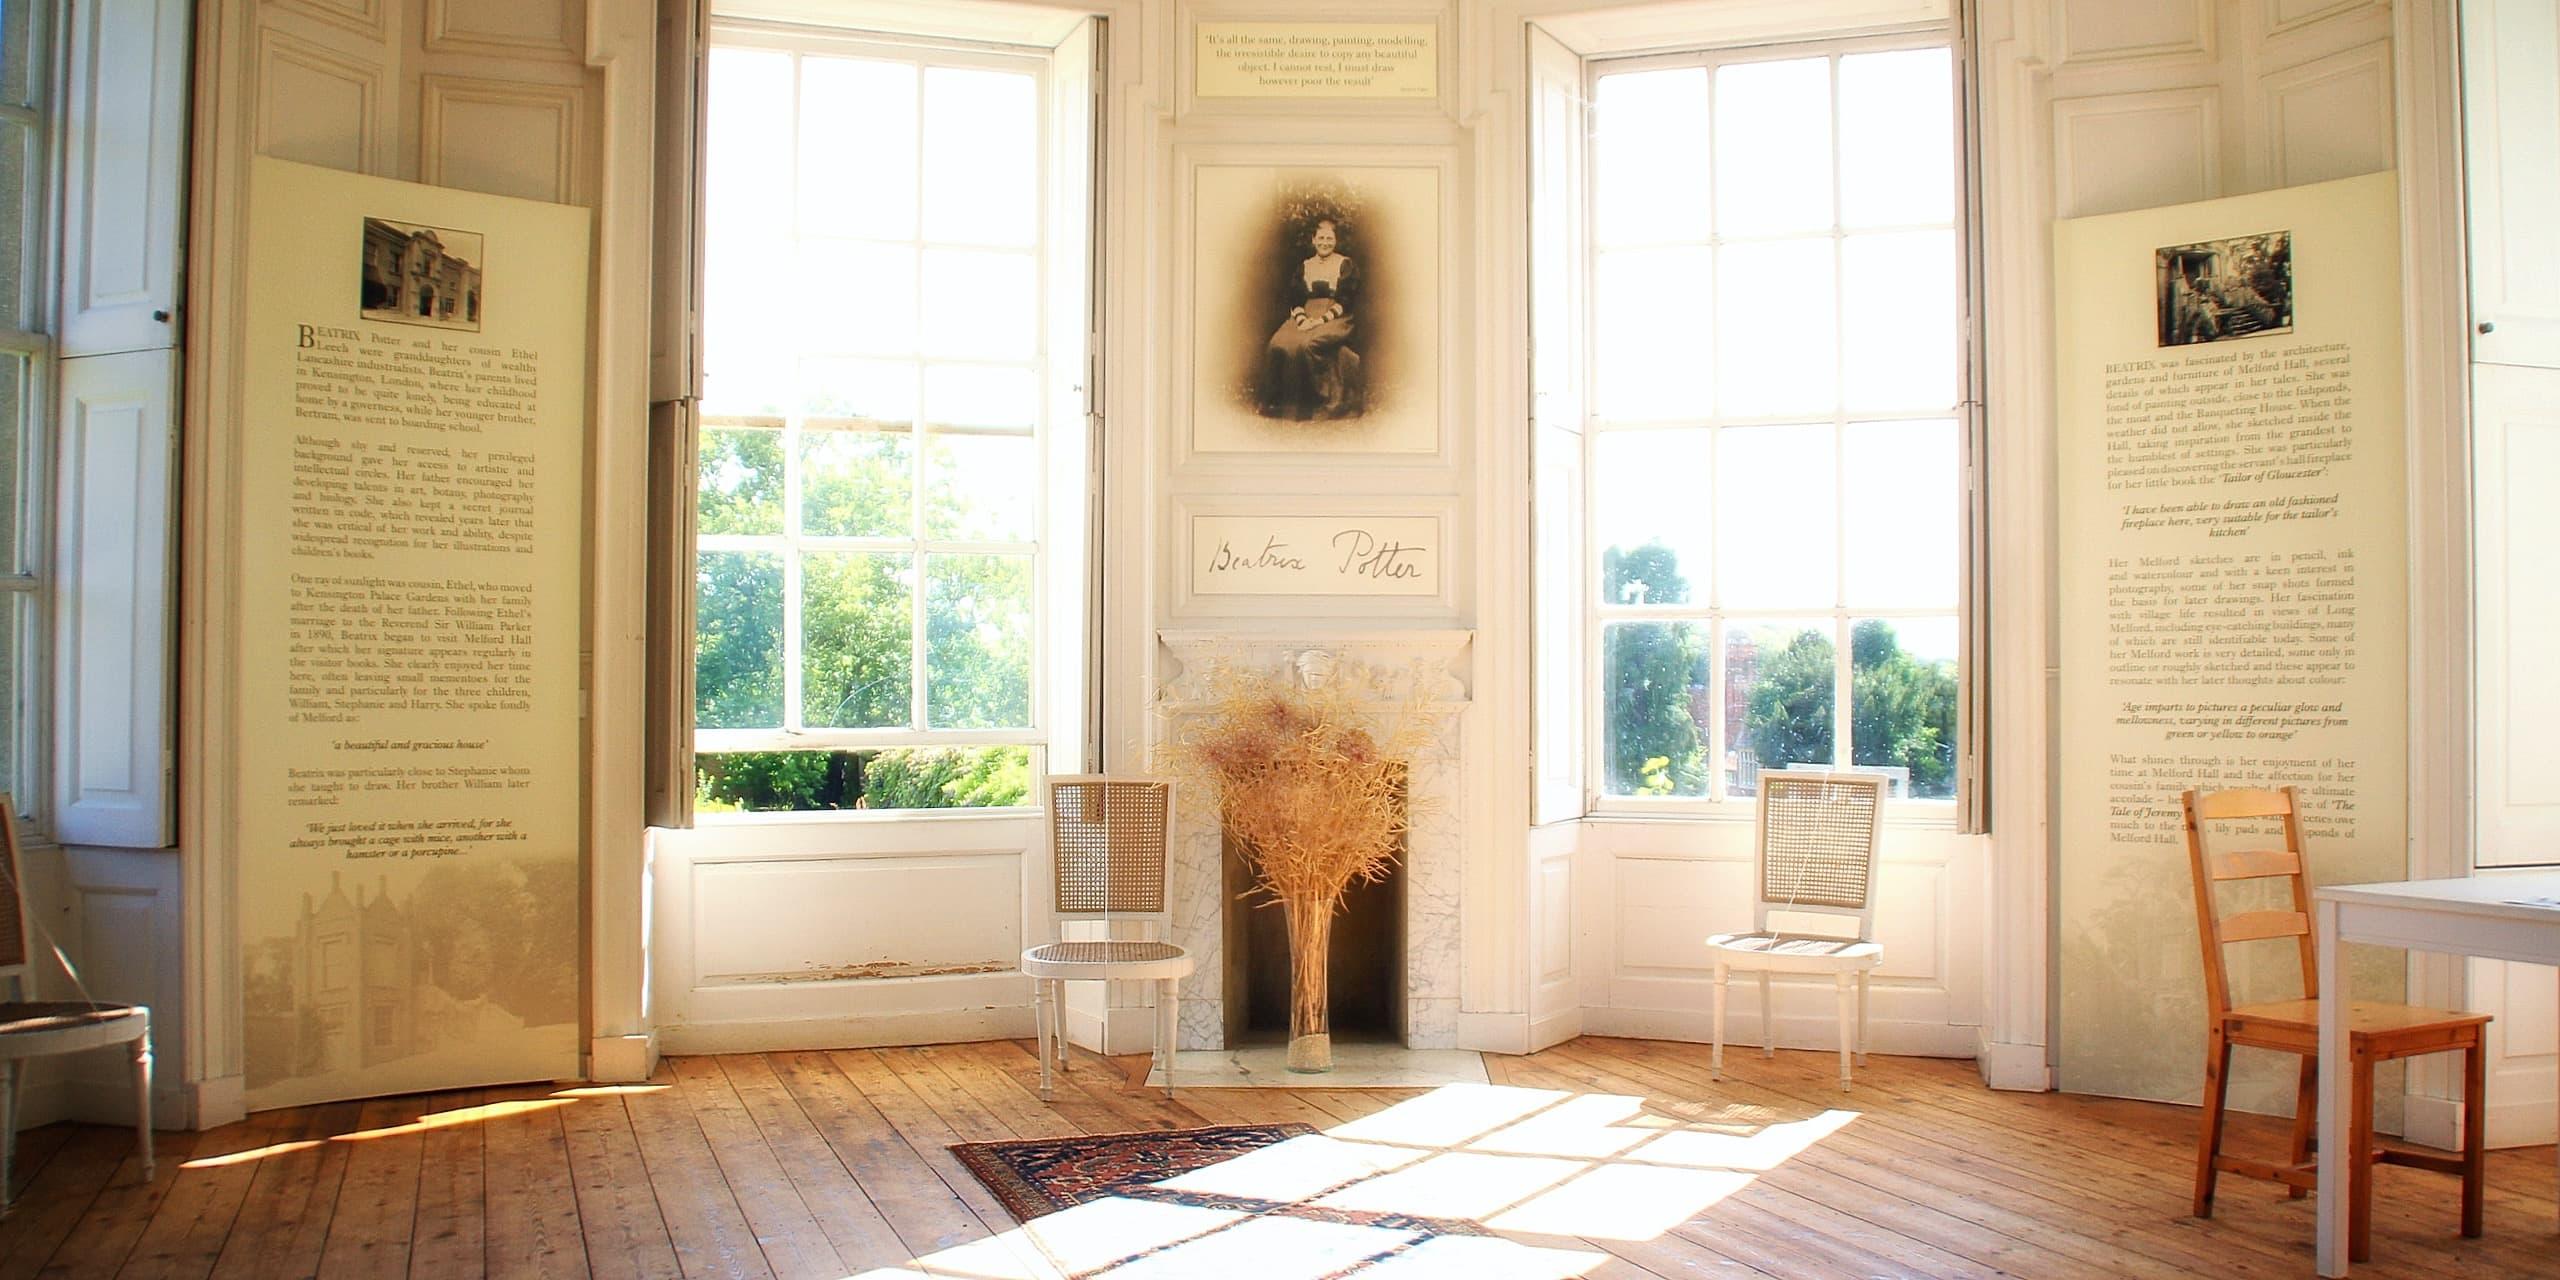 Beatrix Potter & the Herdwick